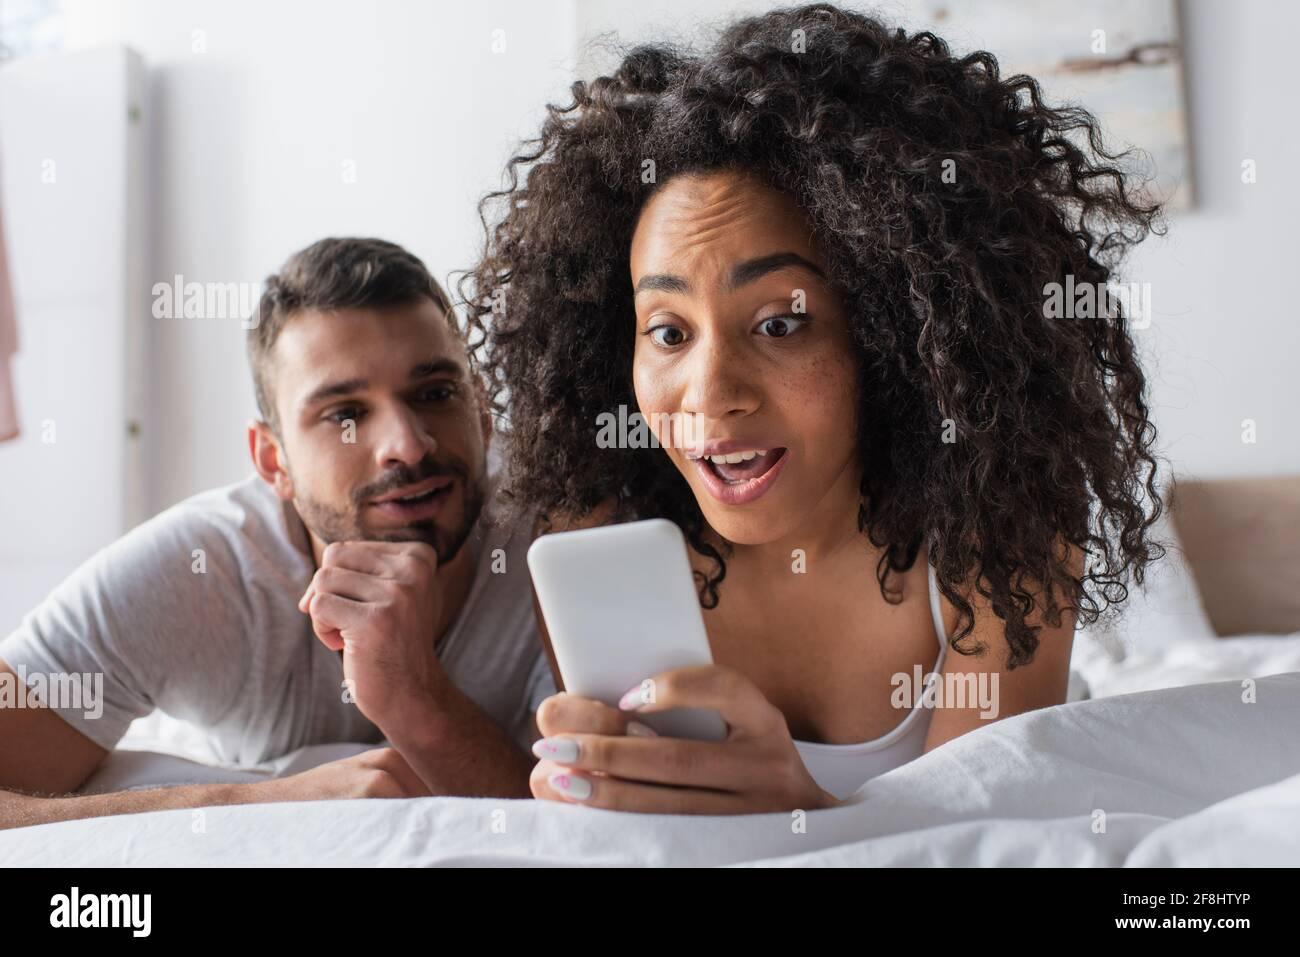 mujer afroamericana sorprendida sosteniendo un smartphone cerca de un novio barbudo fondo borroso Foto de stock